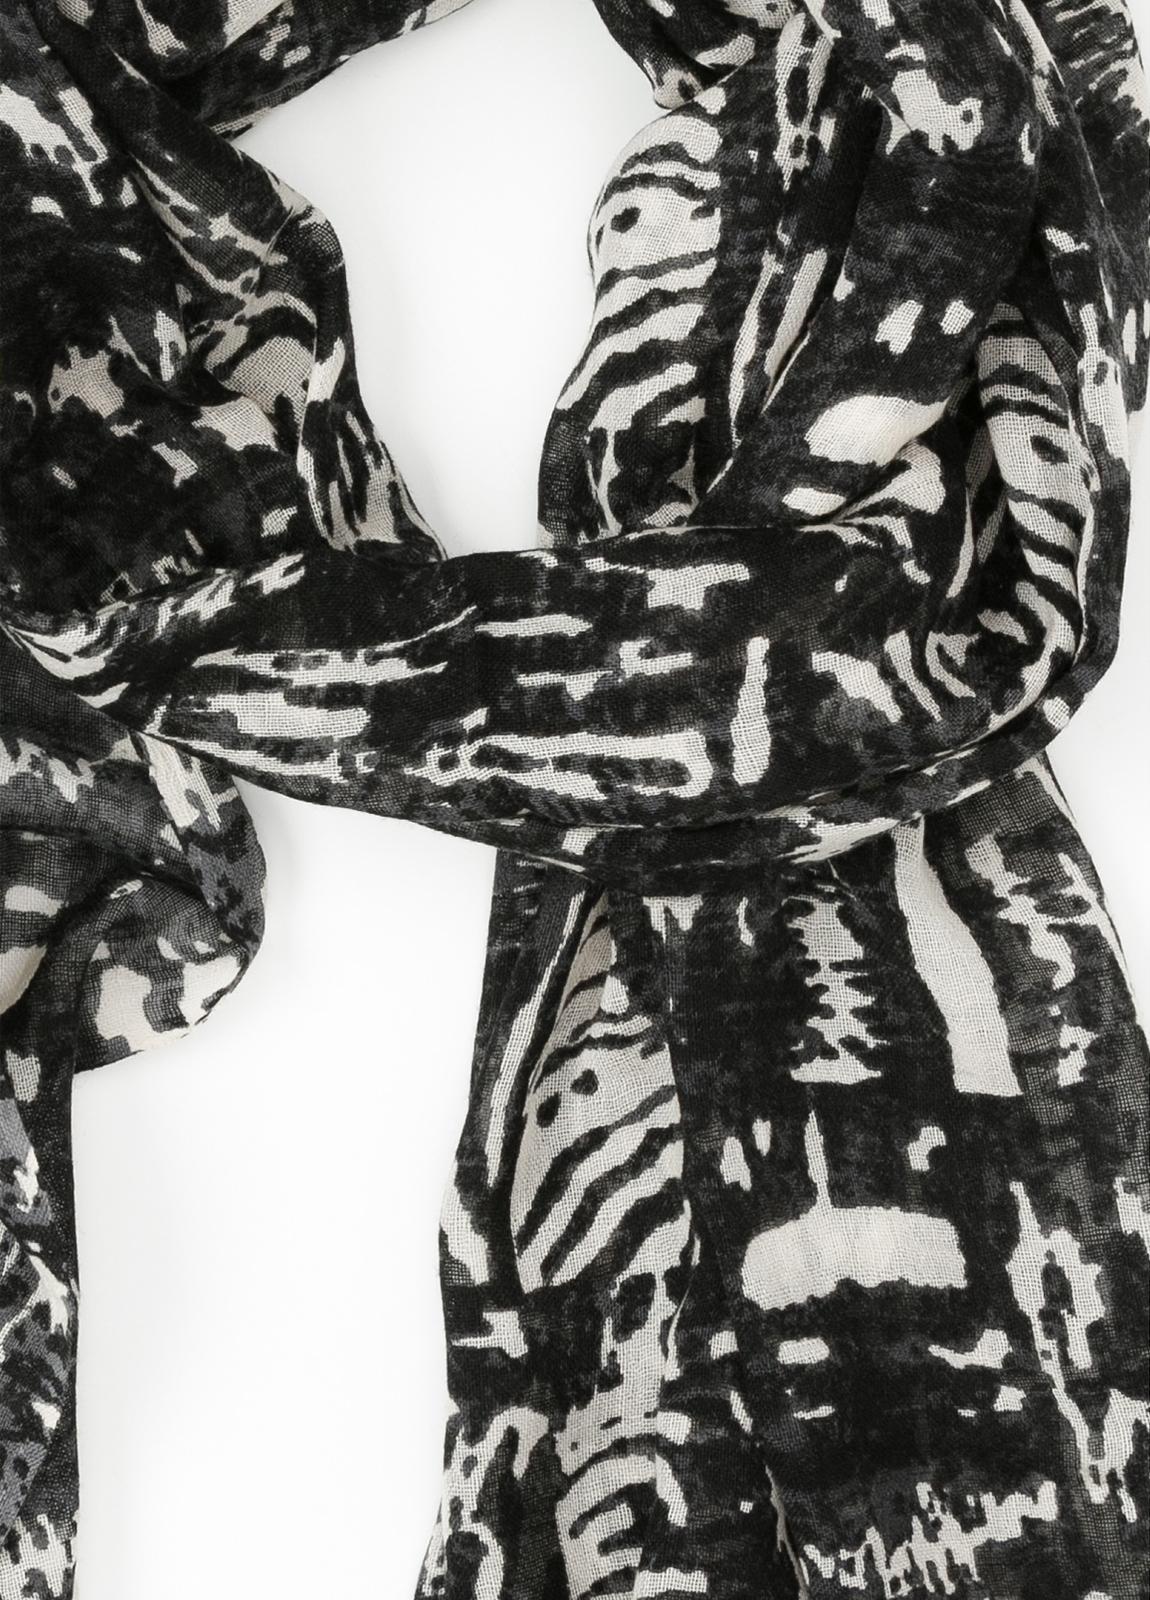 Foulard estampado étnico color gris 70 x 200 cm. 100% Lana. - Ítem1